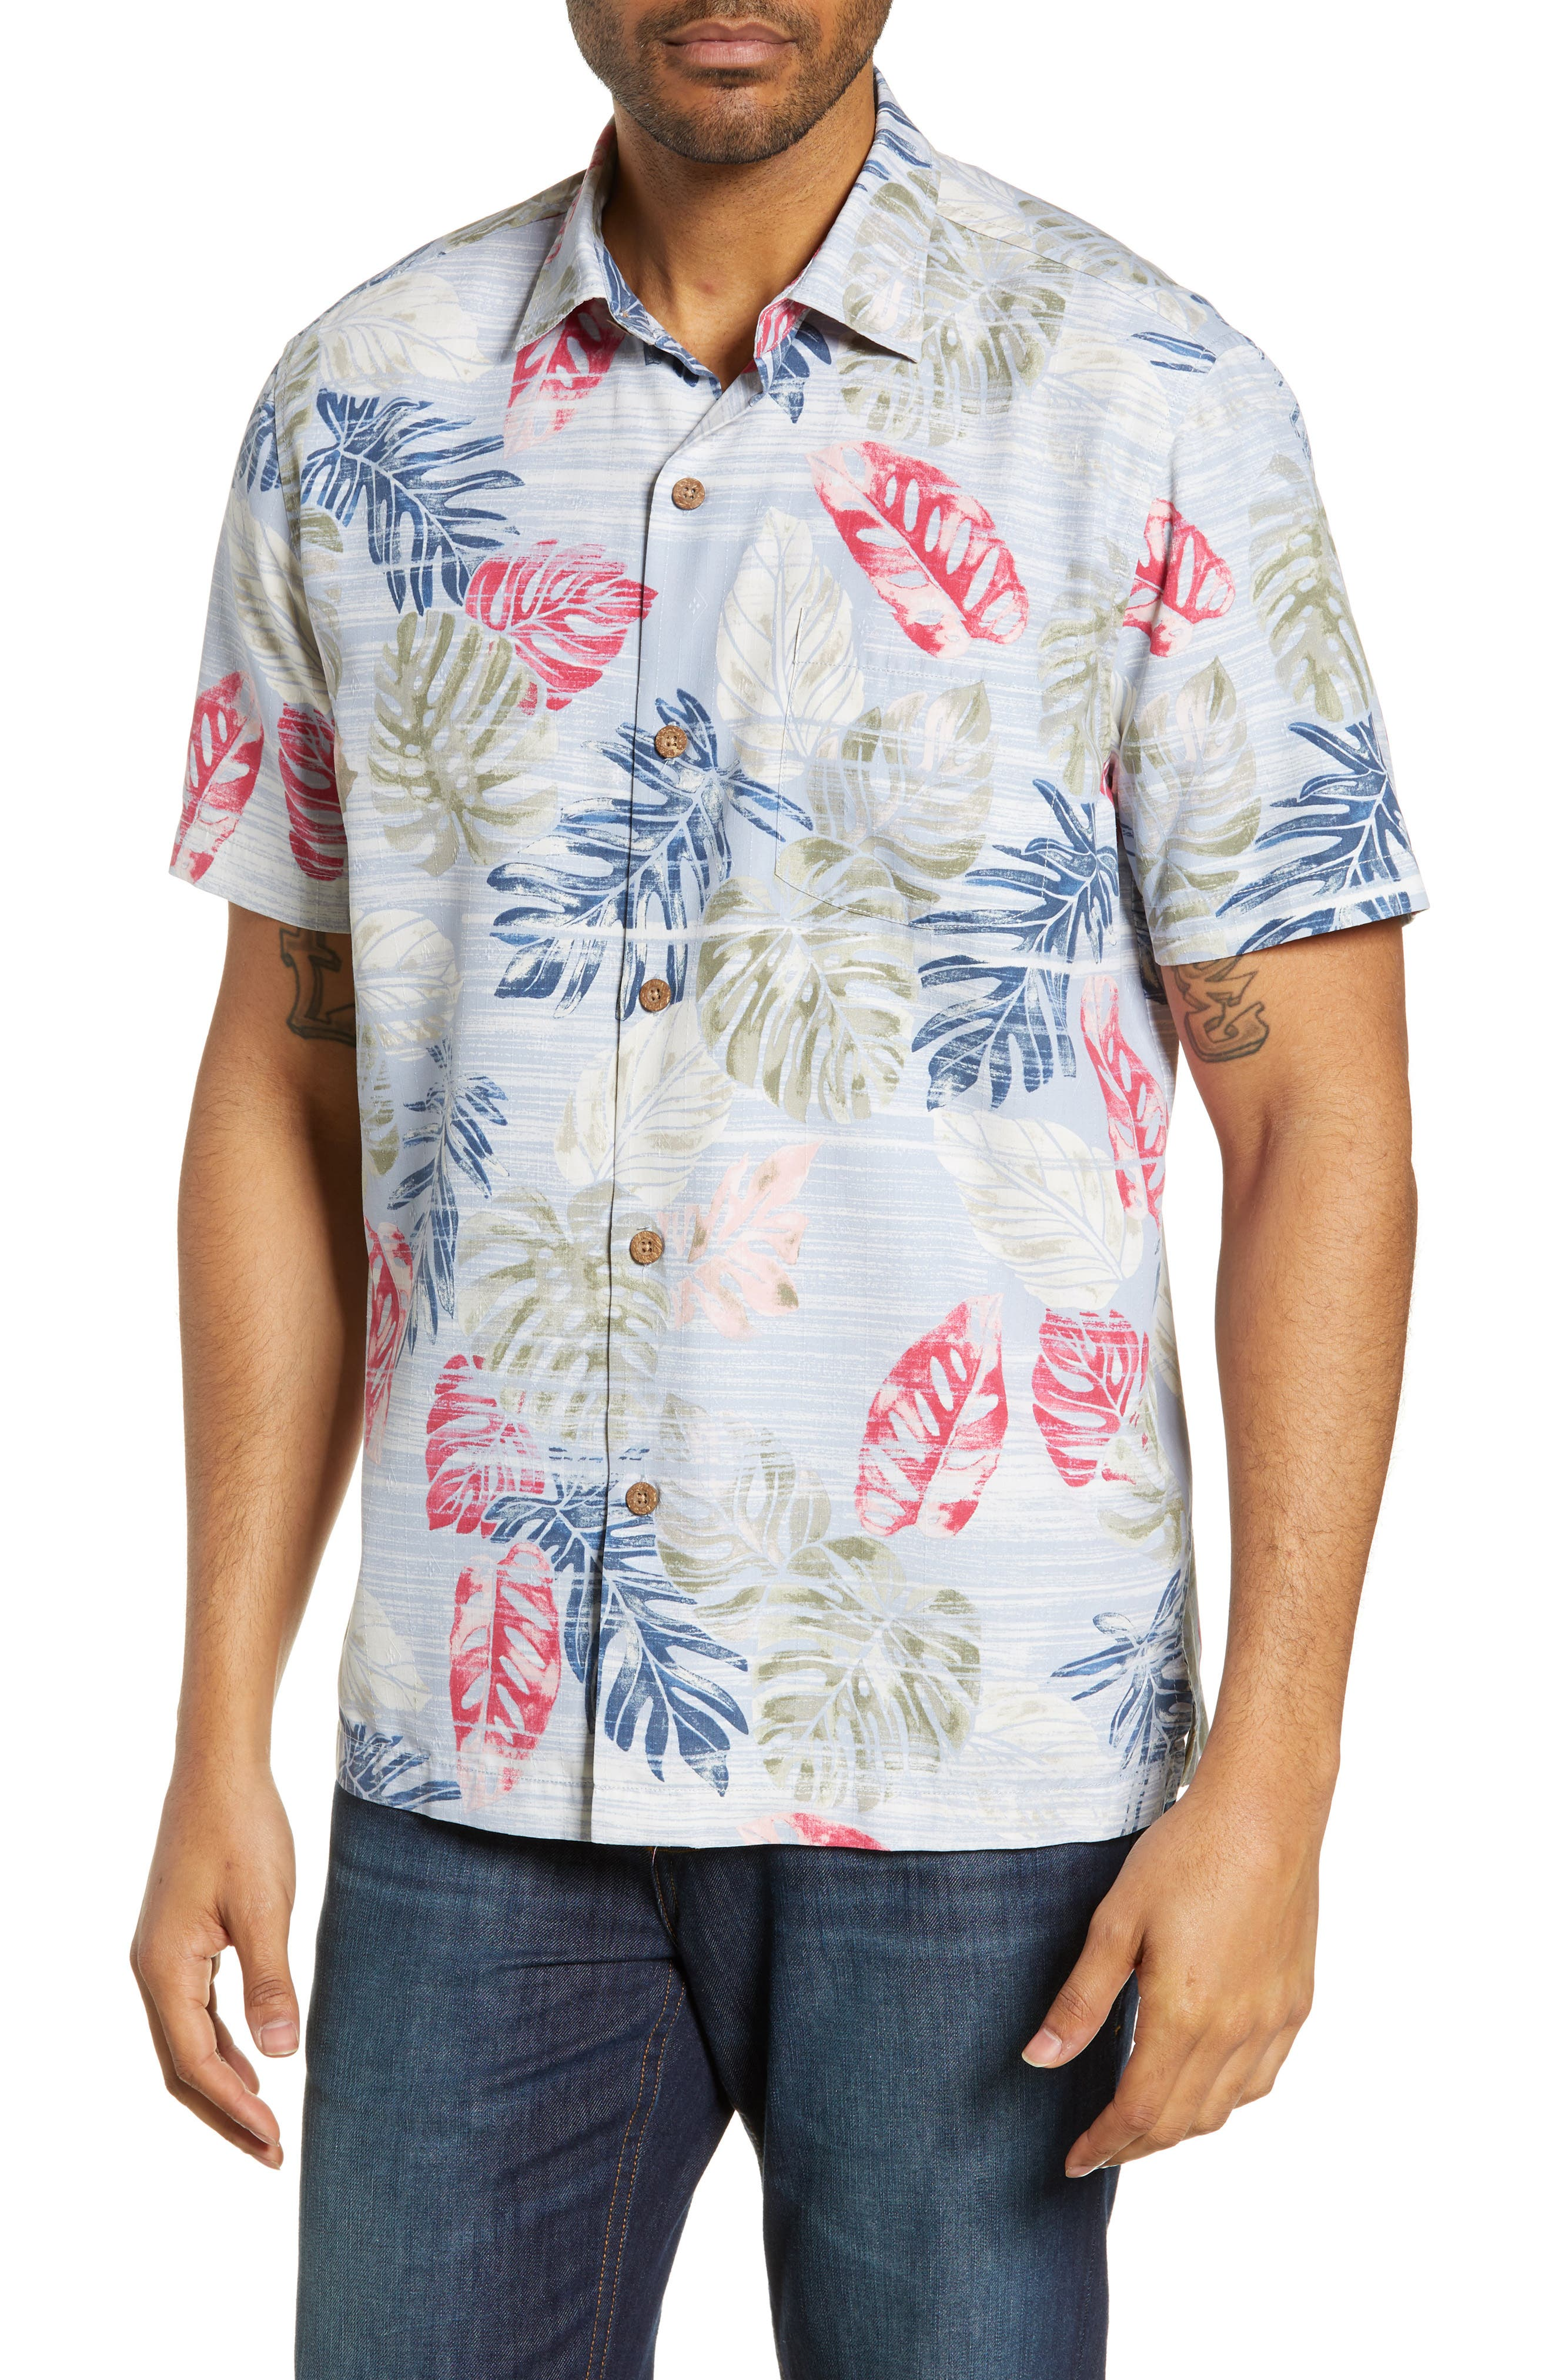 TOMMY BAHAMA,                             Botanica Sketch Silk Blend Shirt,                             Main thumbnail 1, color,                             CANYON SKY